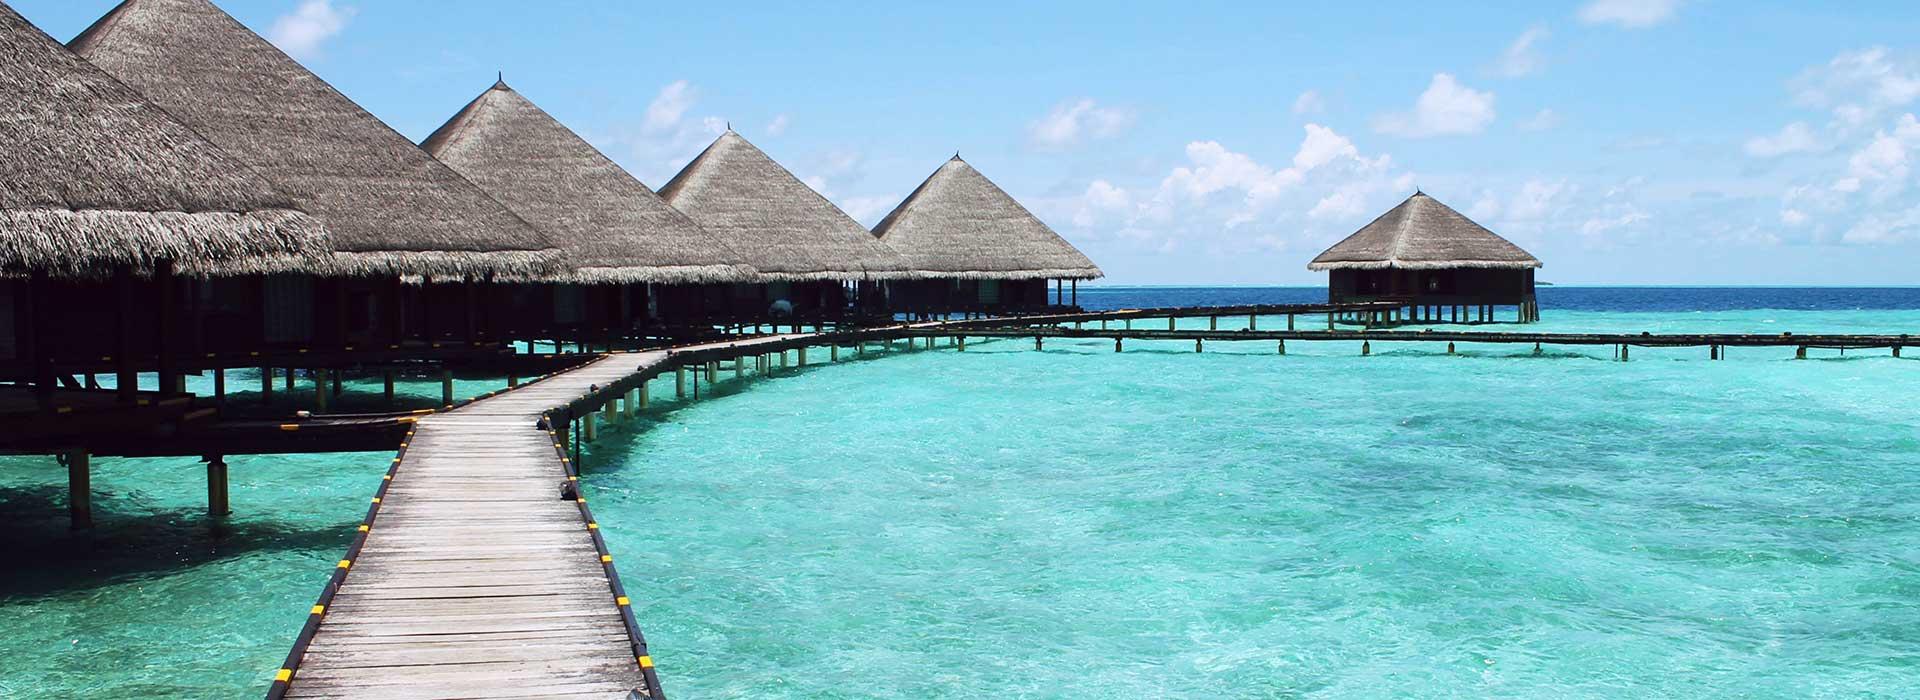 beach-vacation-water-summer